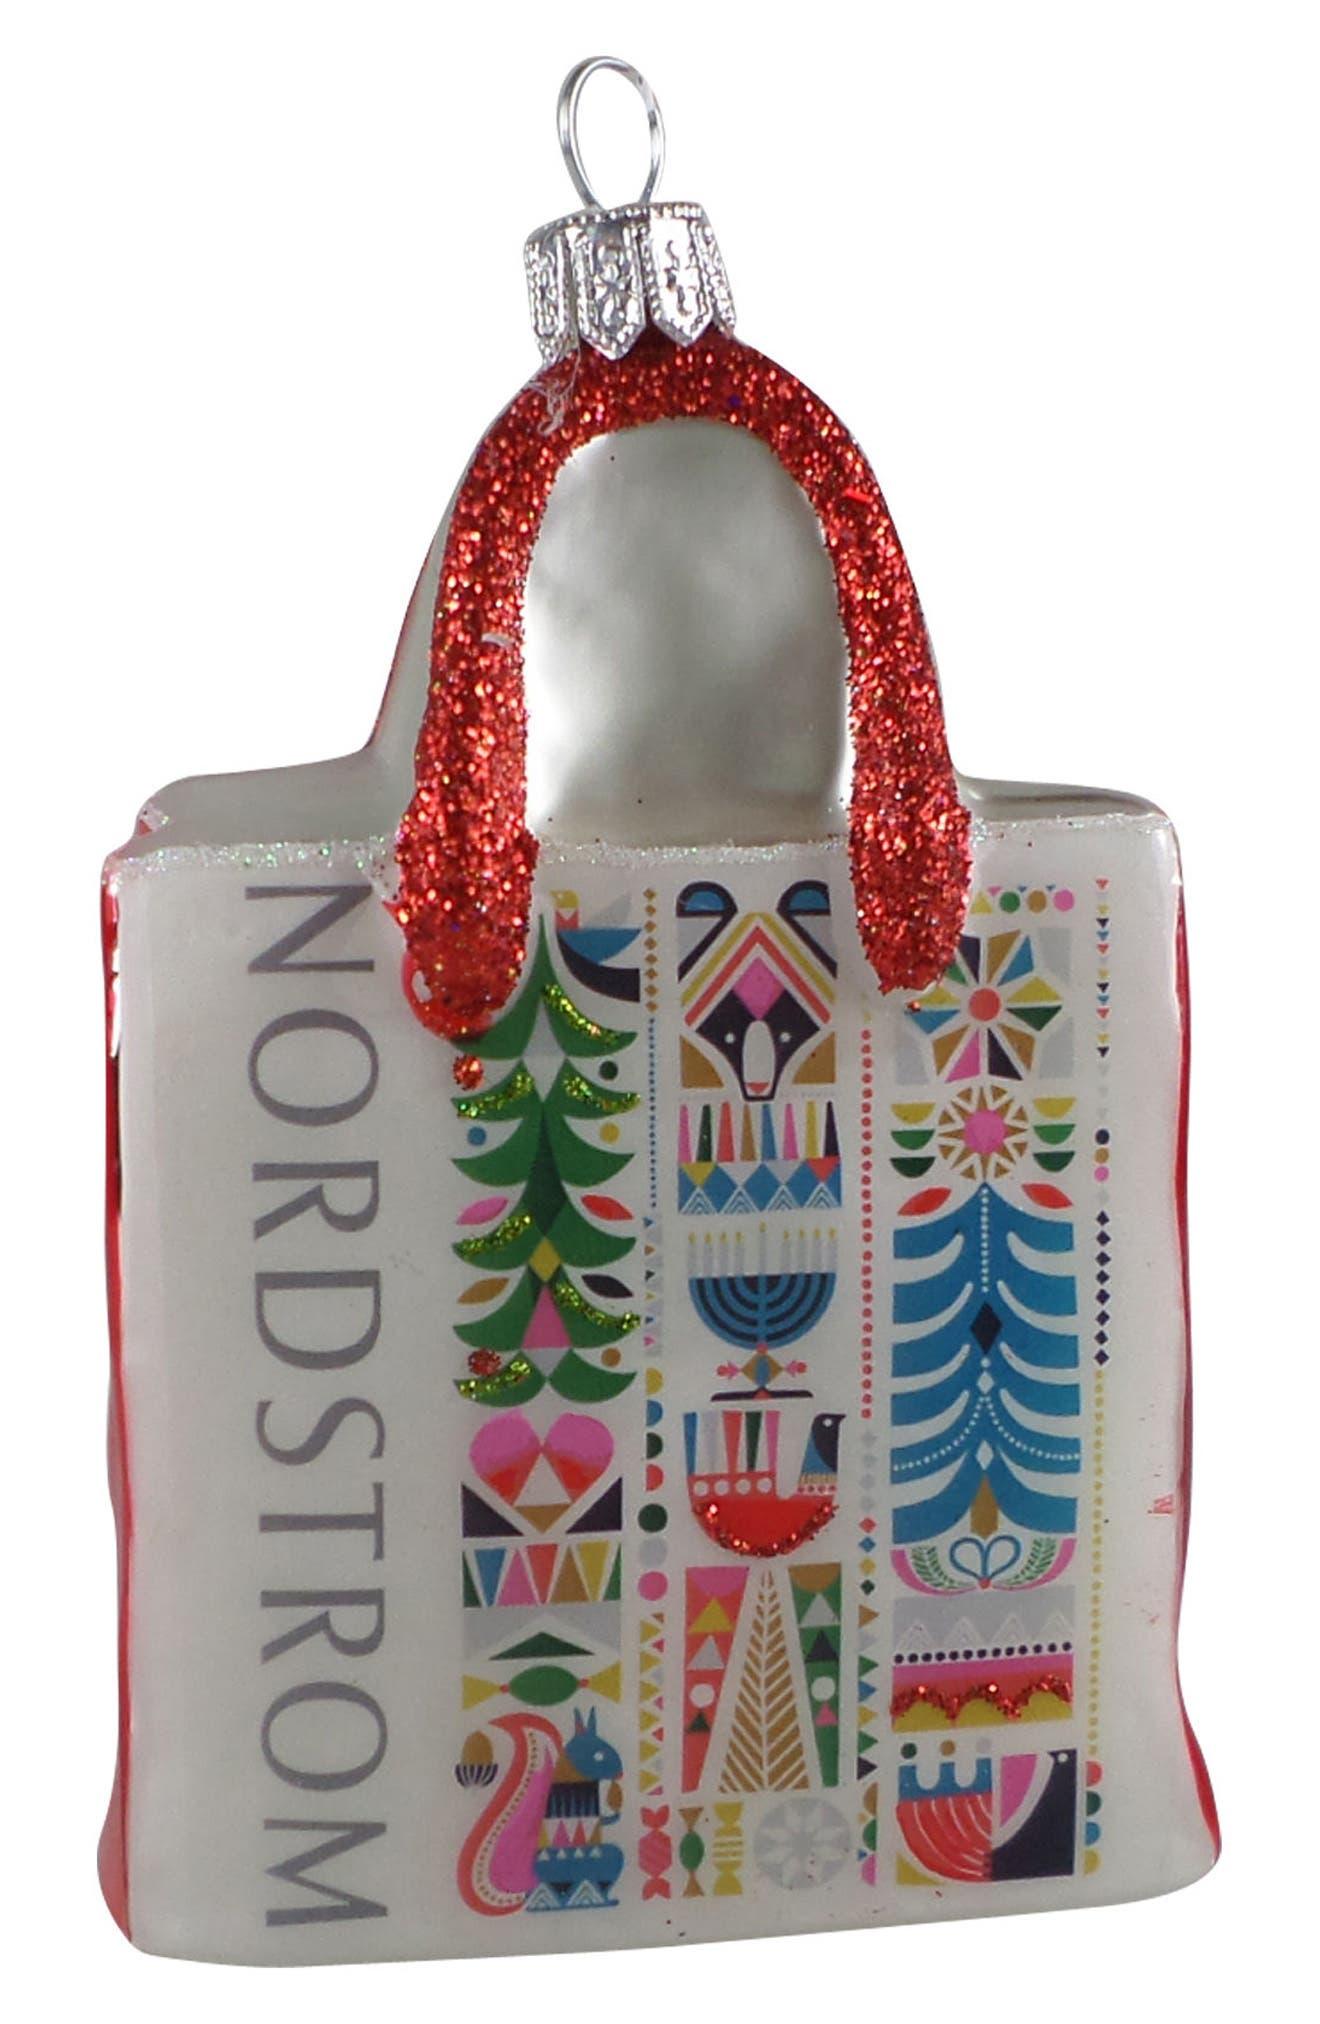 Main Image - Nordstrom at Home Nordstrom Shopping Bag 2017 Ornament